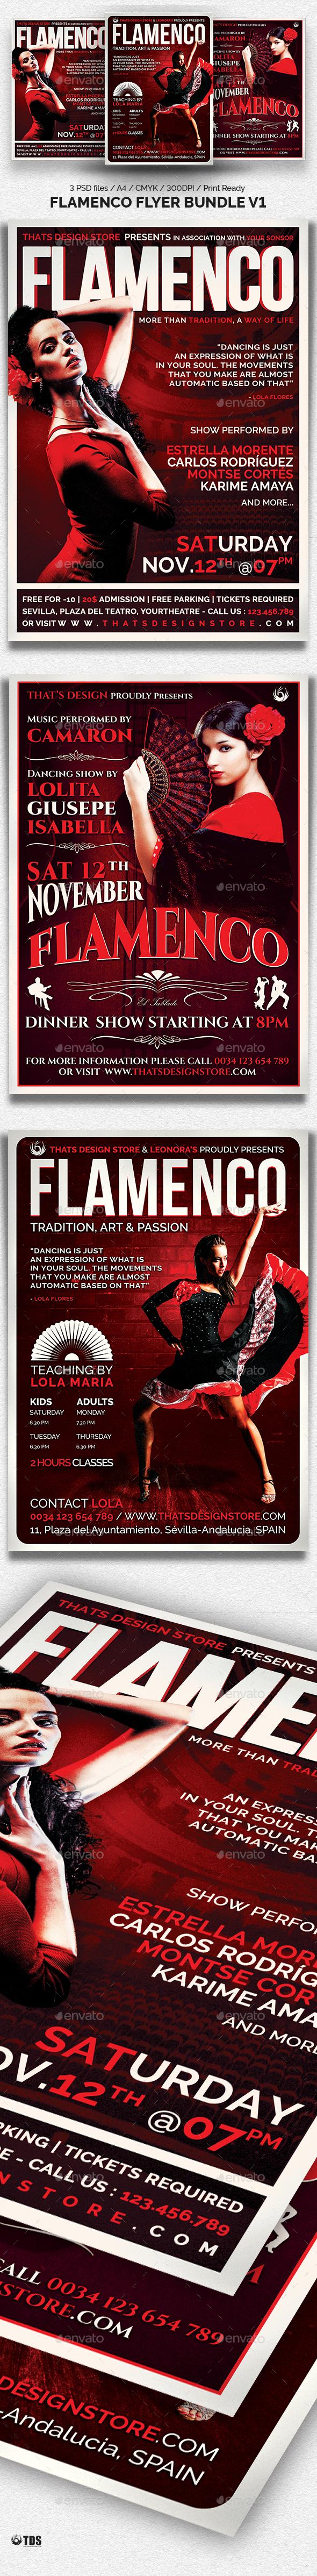 Flamenco Flyer Bundle V1 - Events Flyers